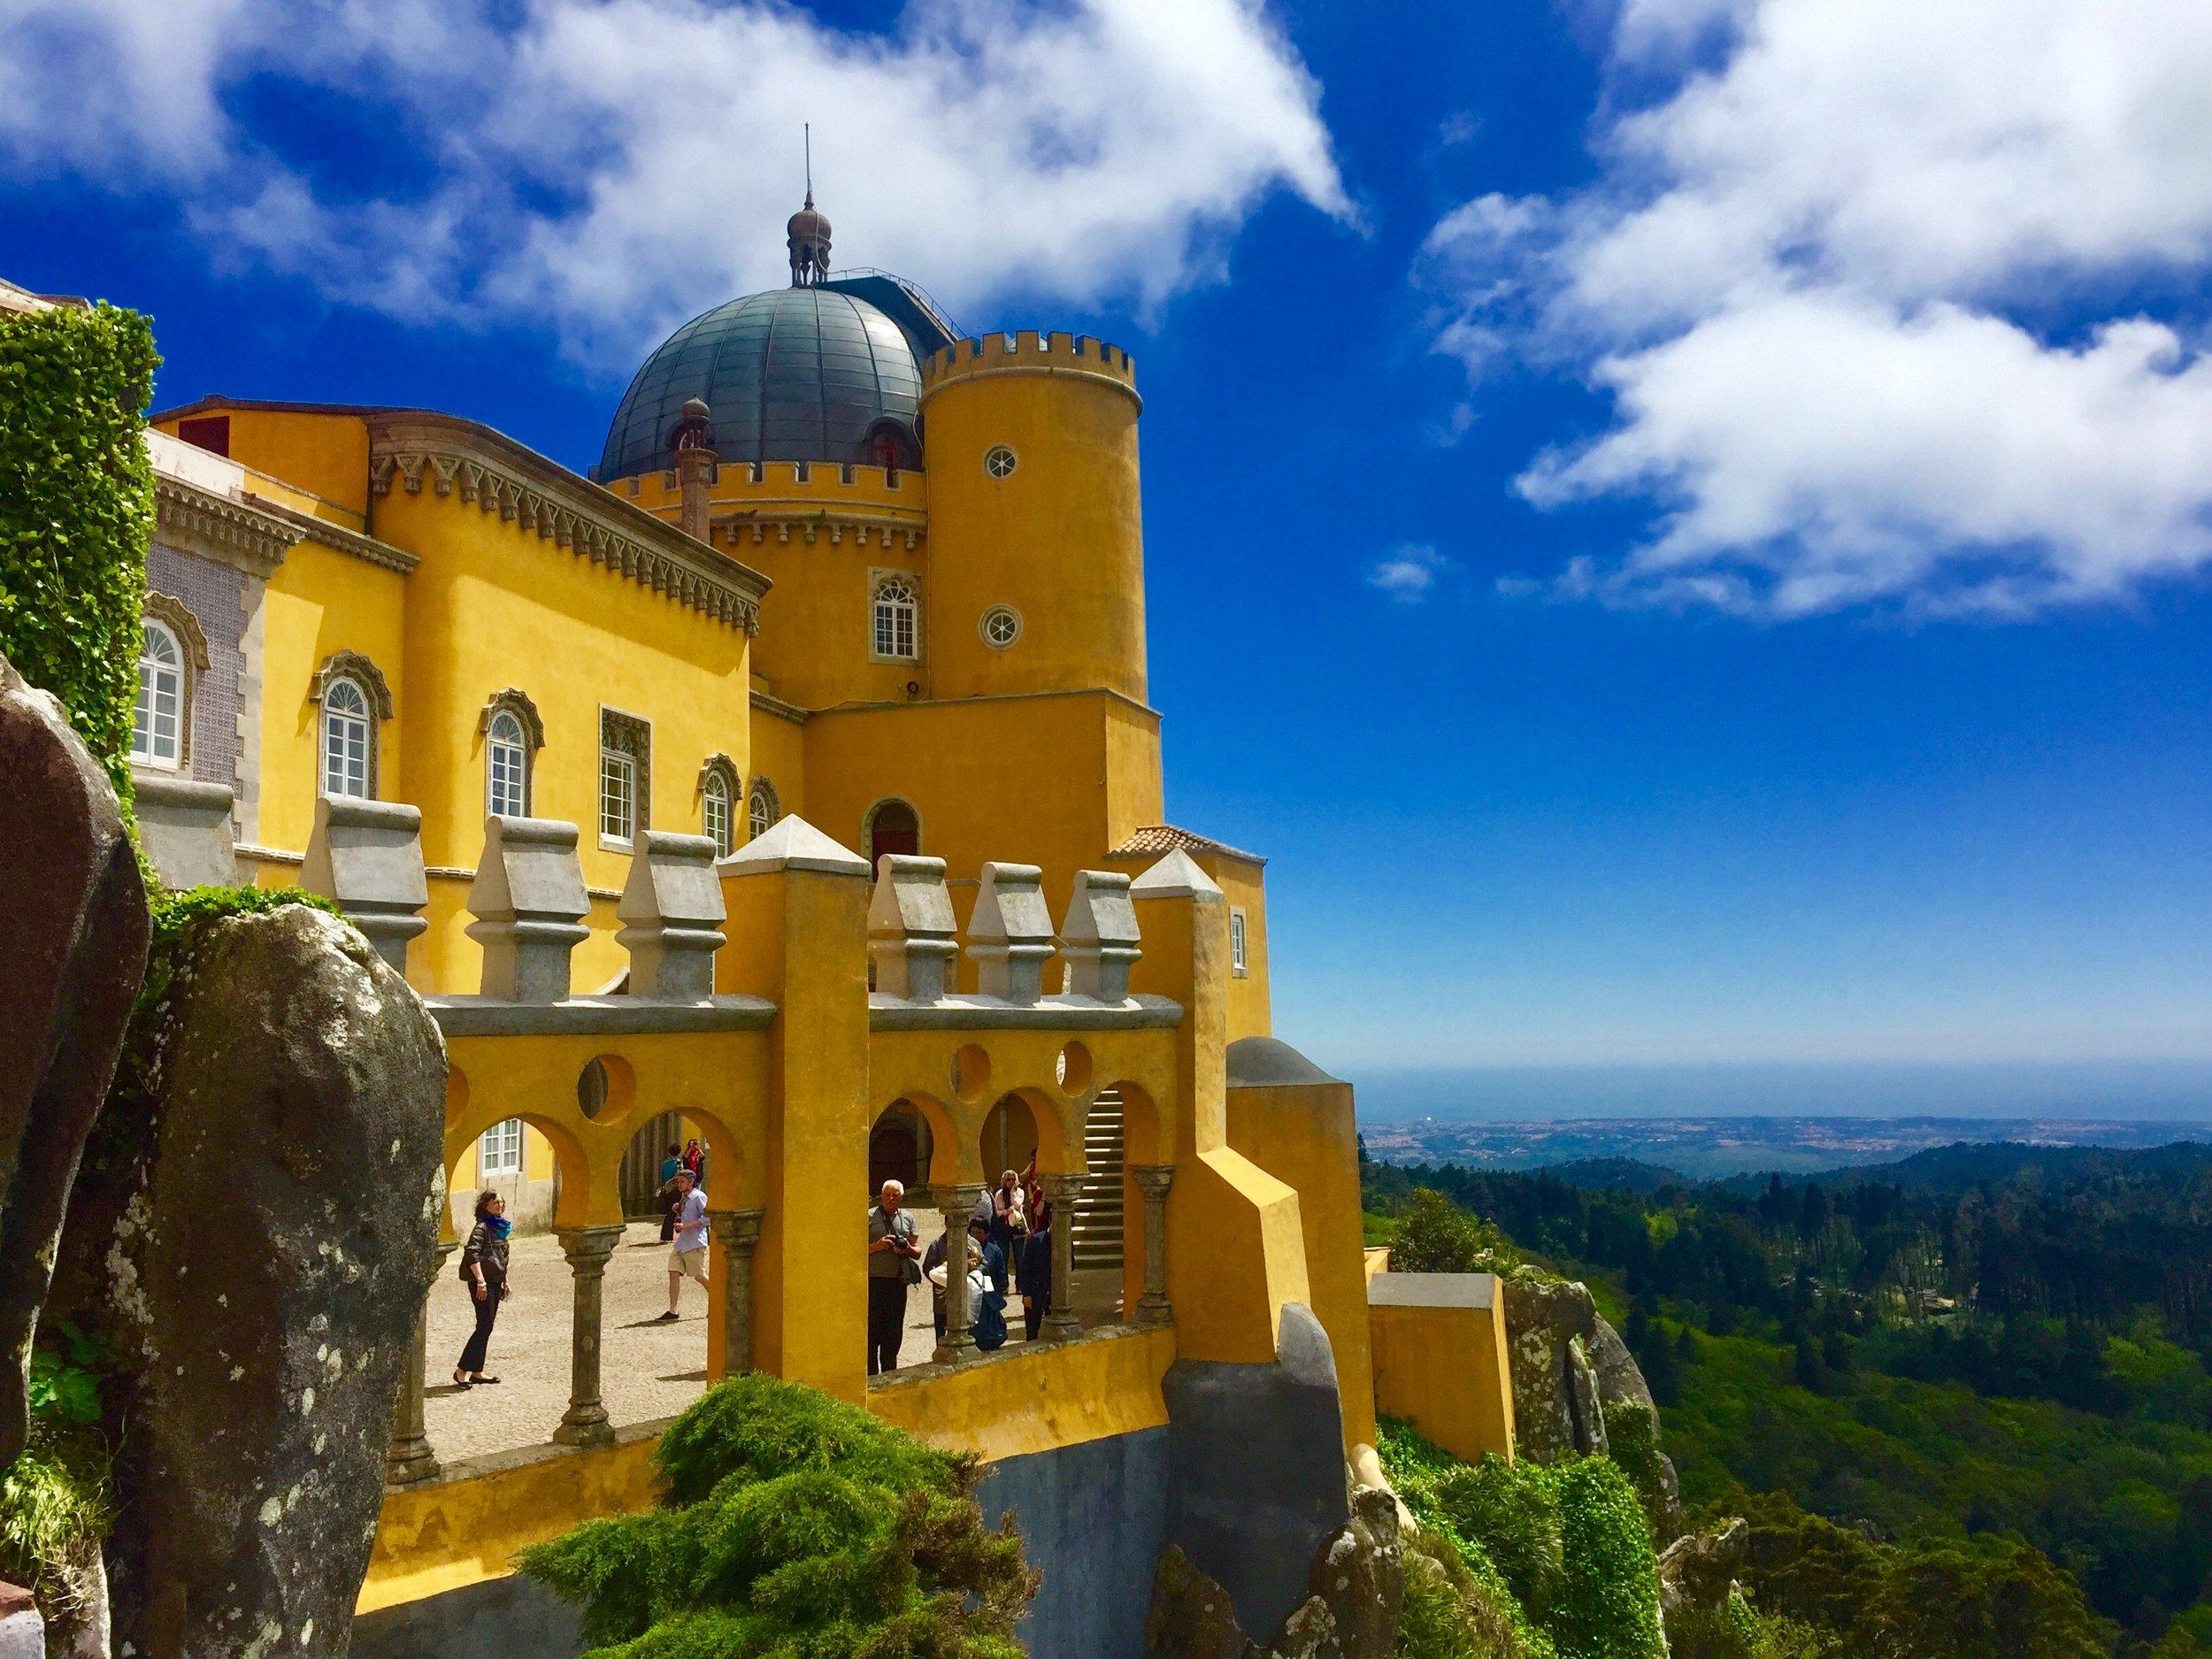 Park and National Palace of Pena in Lisbon, Portugal by Jenvmy via Unsplash